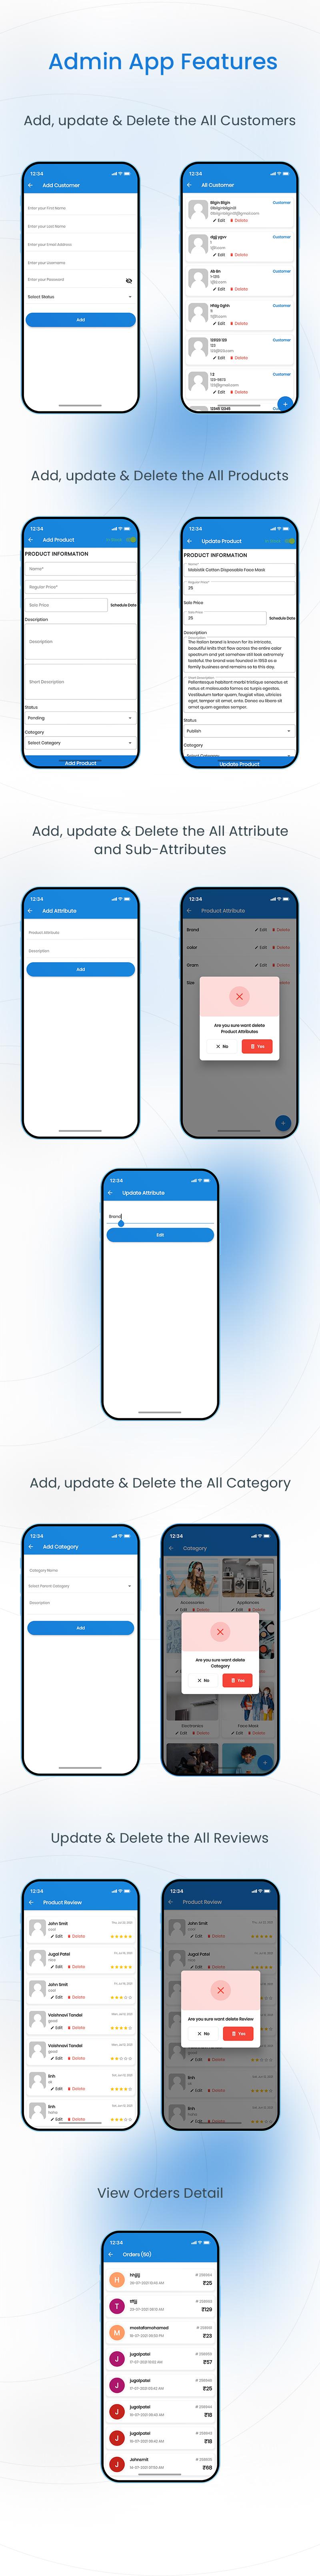 Woocommerce Admin and Dokan vendor app | Store Manager | Iqonic Design woocommerce admin and dokan vendor app Store Manager 02 admin